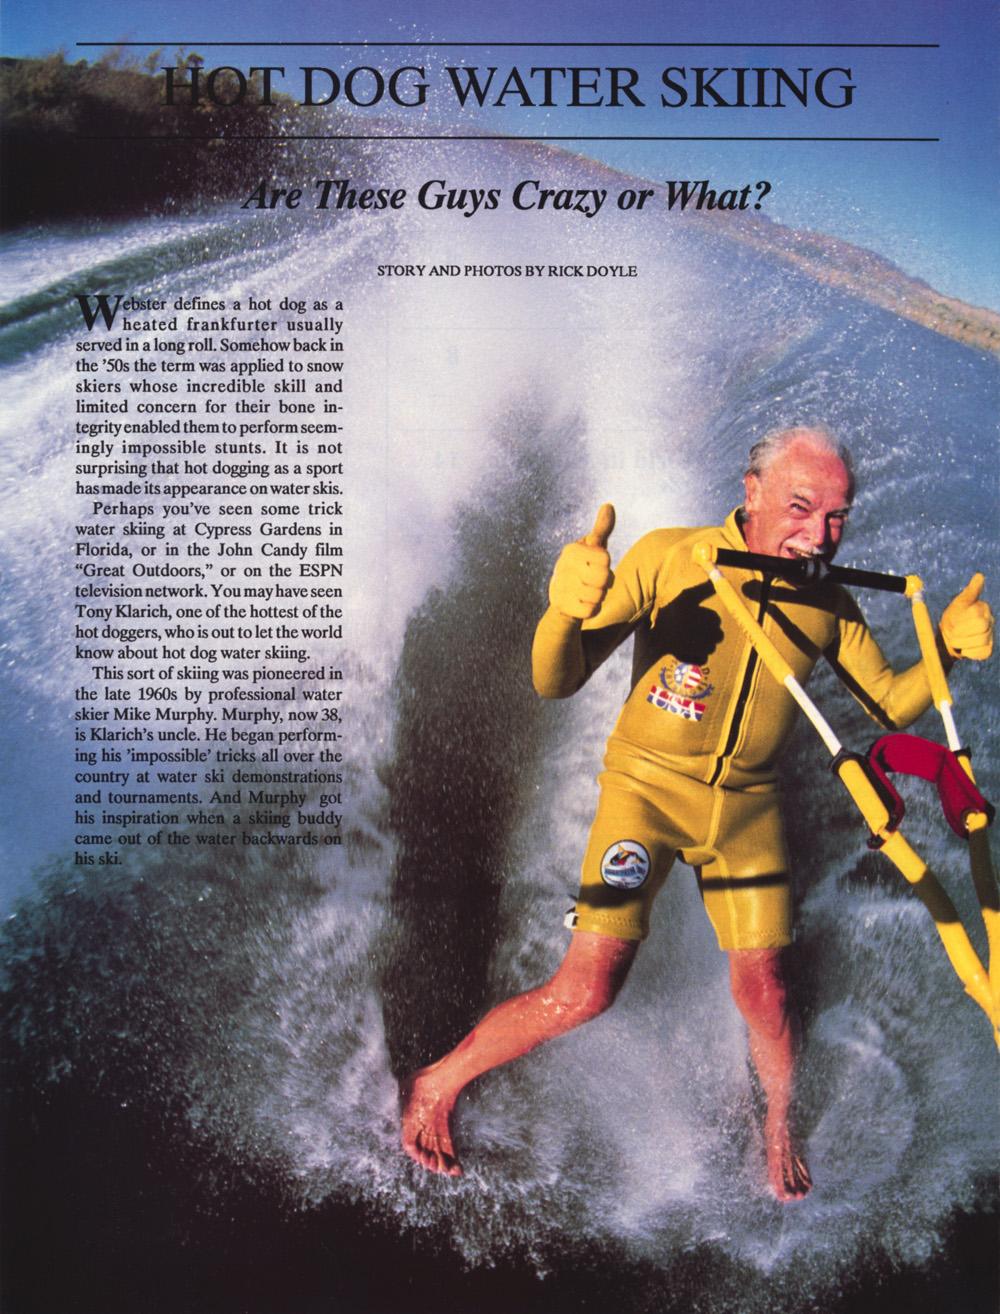 Nissan Hot Dog Water Skiing 1 Banana George Blair Barefooting